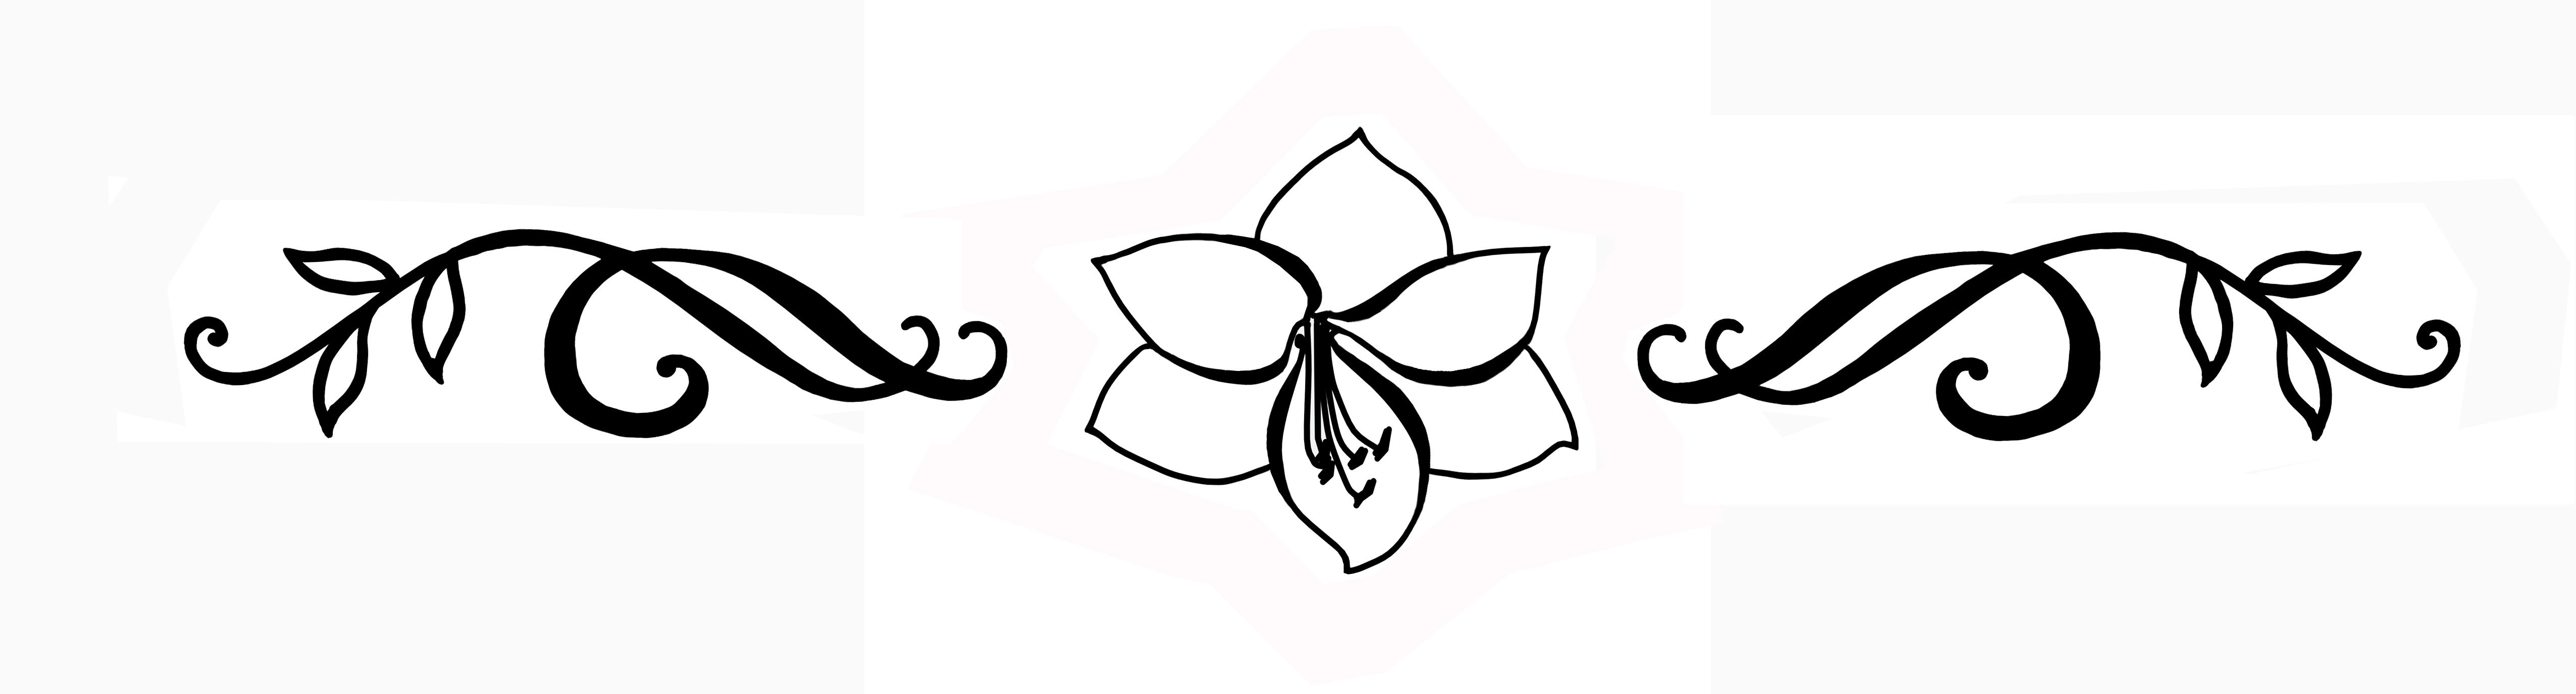 Lilleõis separaator (2).jpg